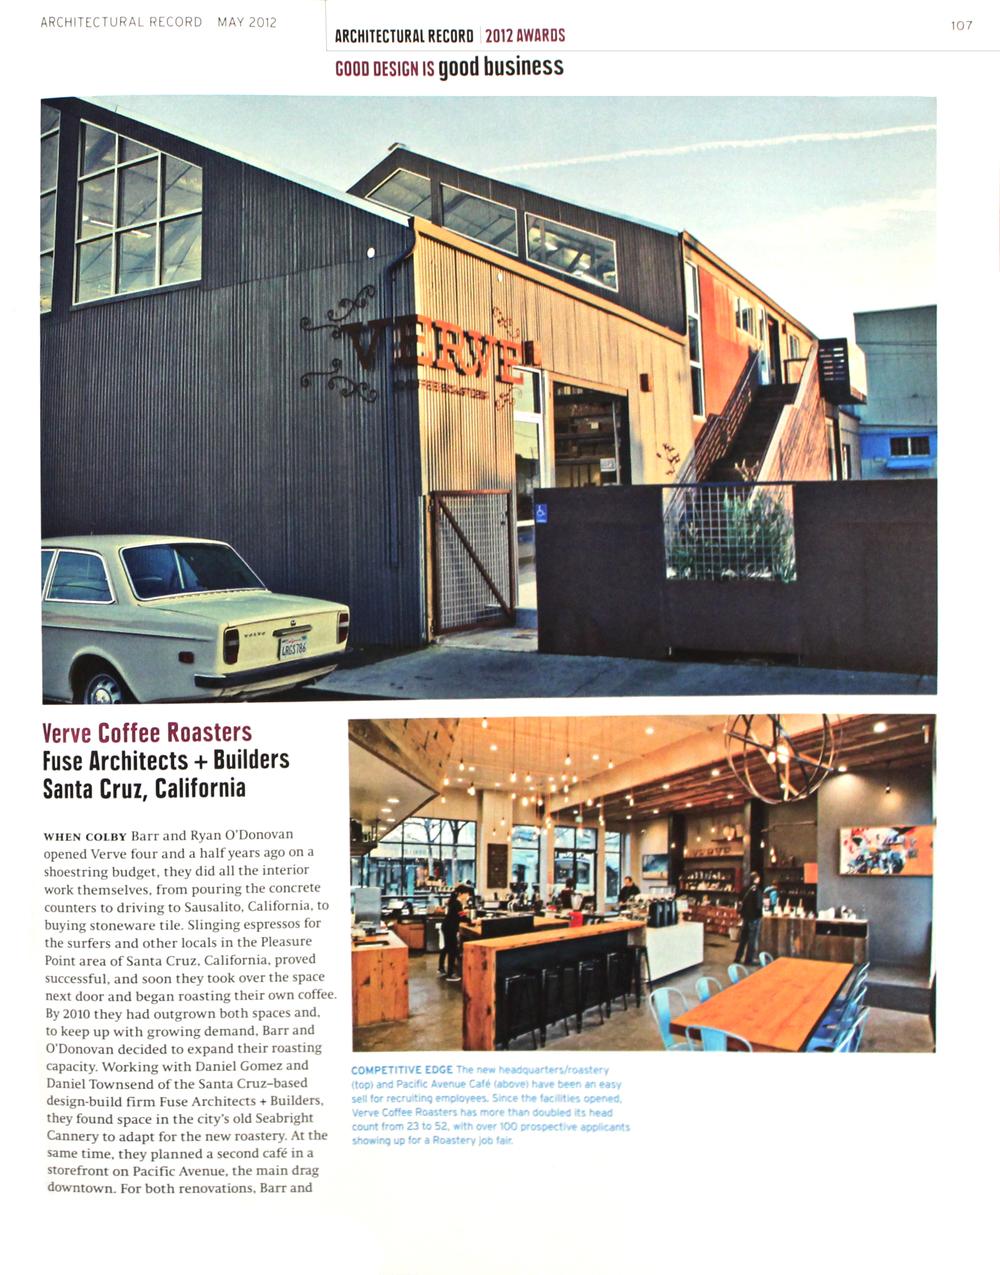 Verve Coffee Roasters Headquarters article - Architectural Record magazine